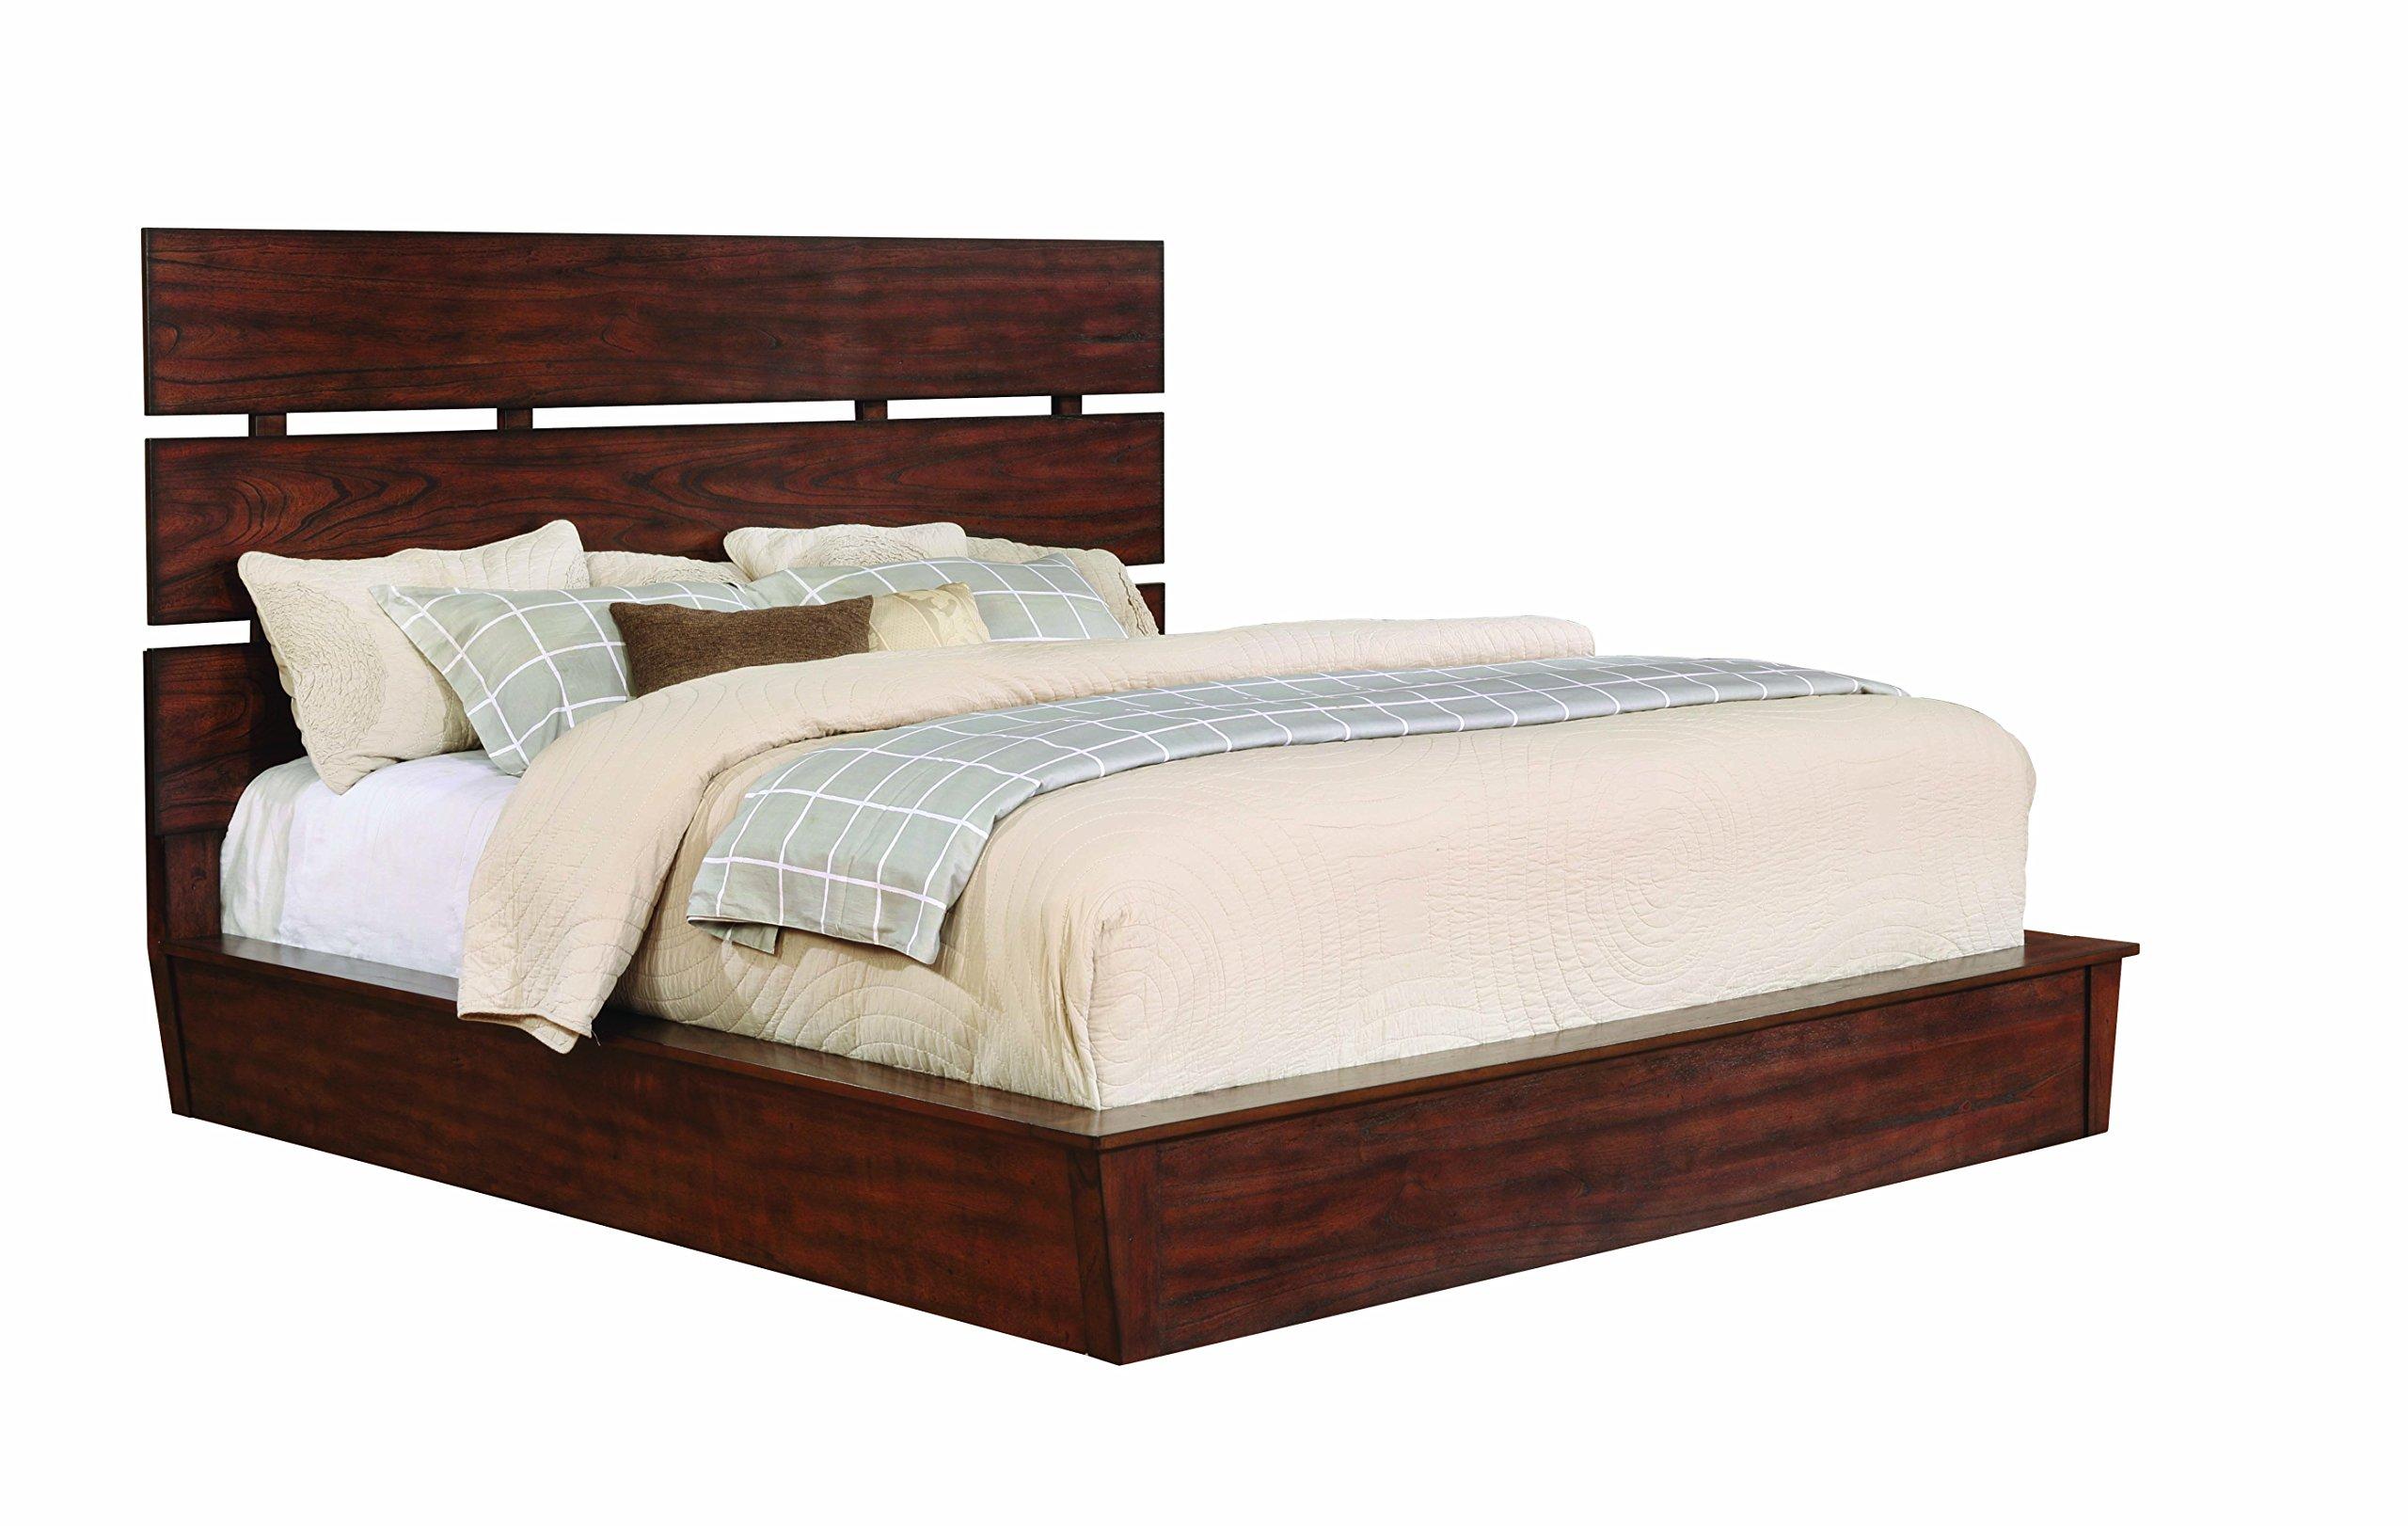 artesia eastern king platform bed with plank headboard dark cocoa lavorist. Black Bedroom Furniture Sets. Home Design Ideas